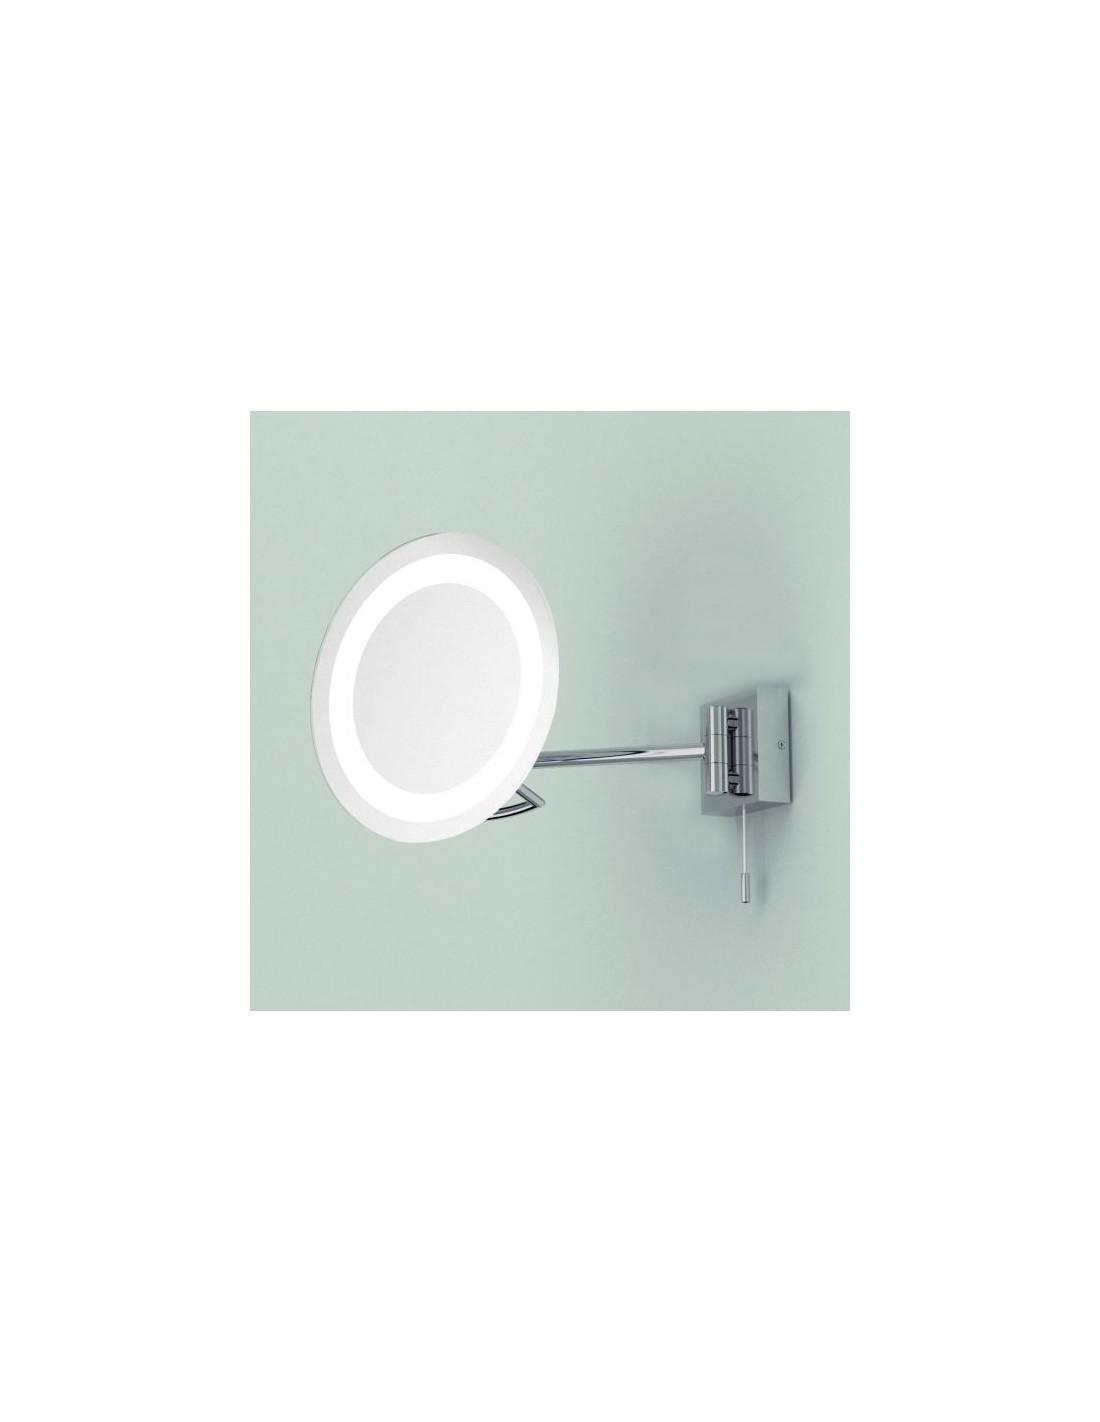 Miroir Gena Astro lighting - Valente Design